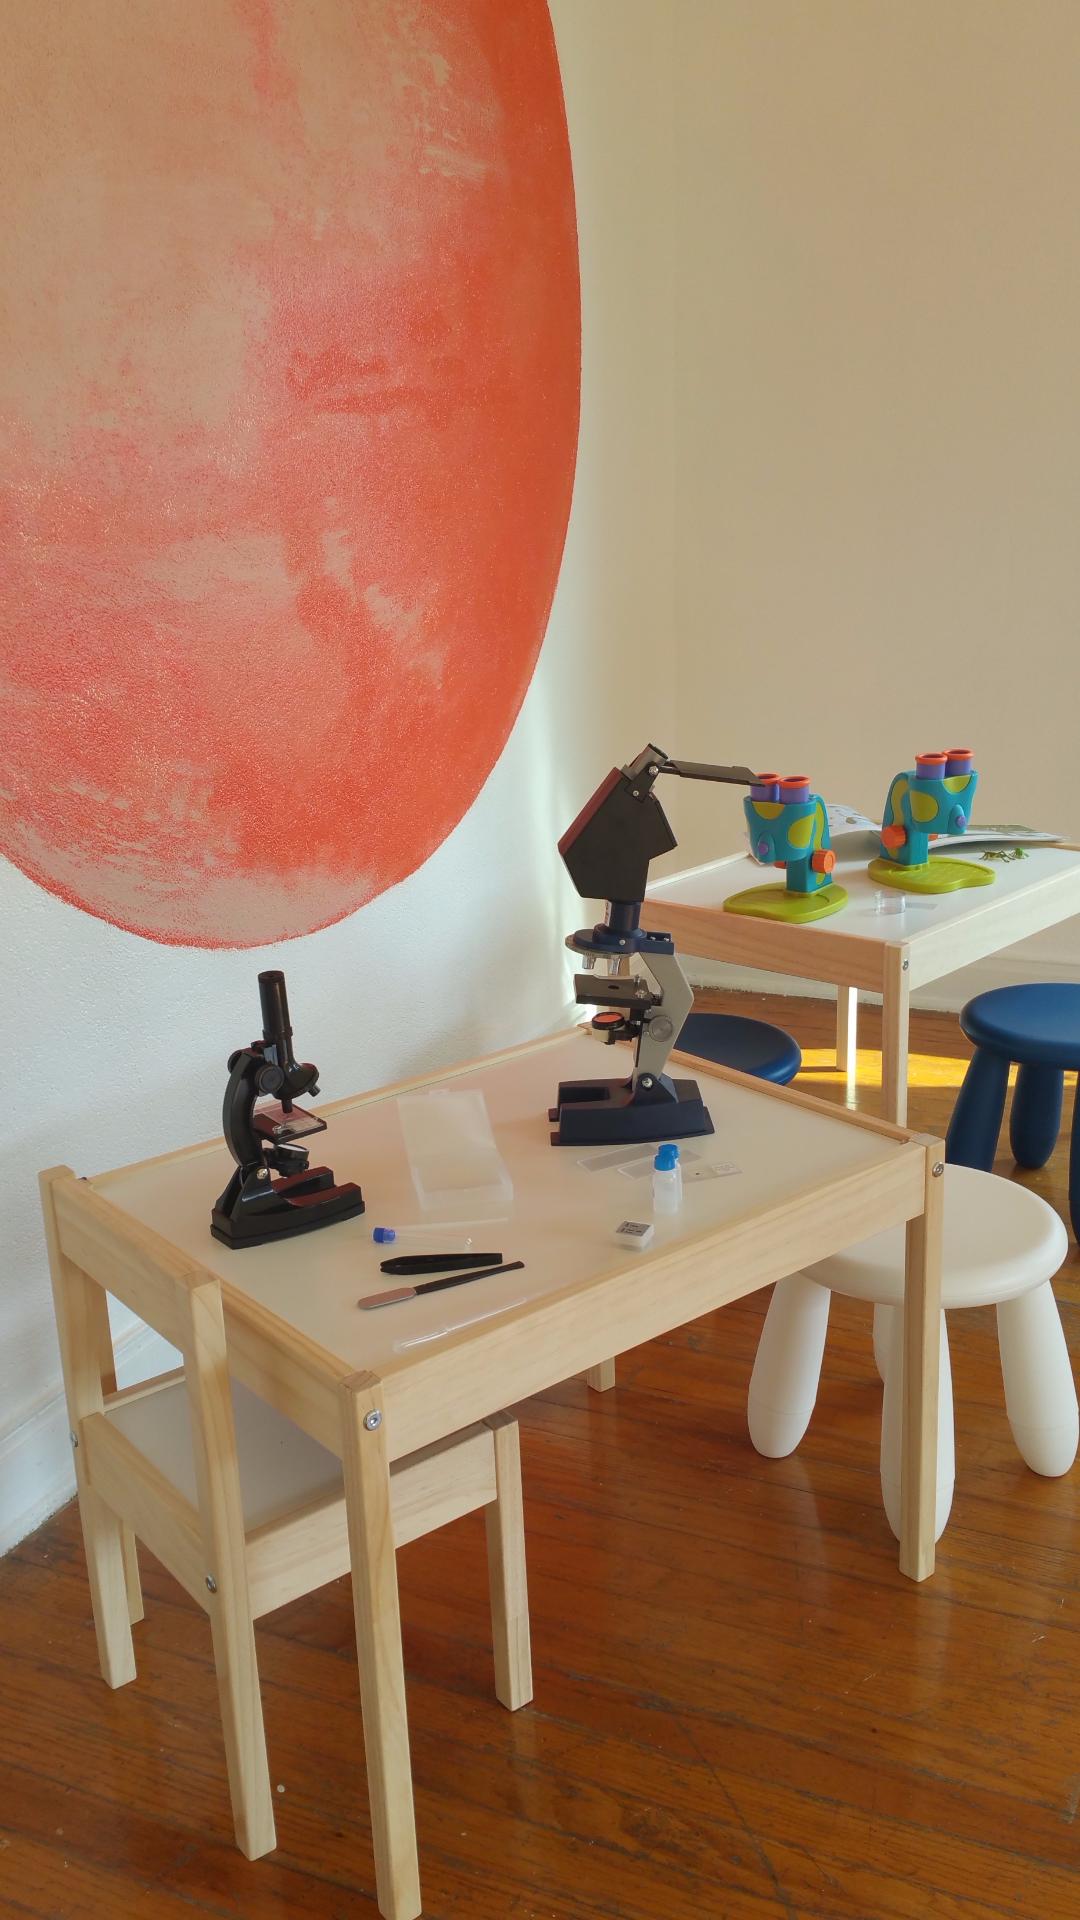 Mars room at Copernicus